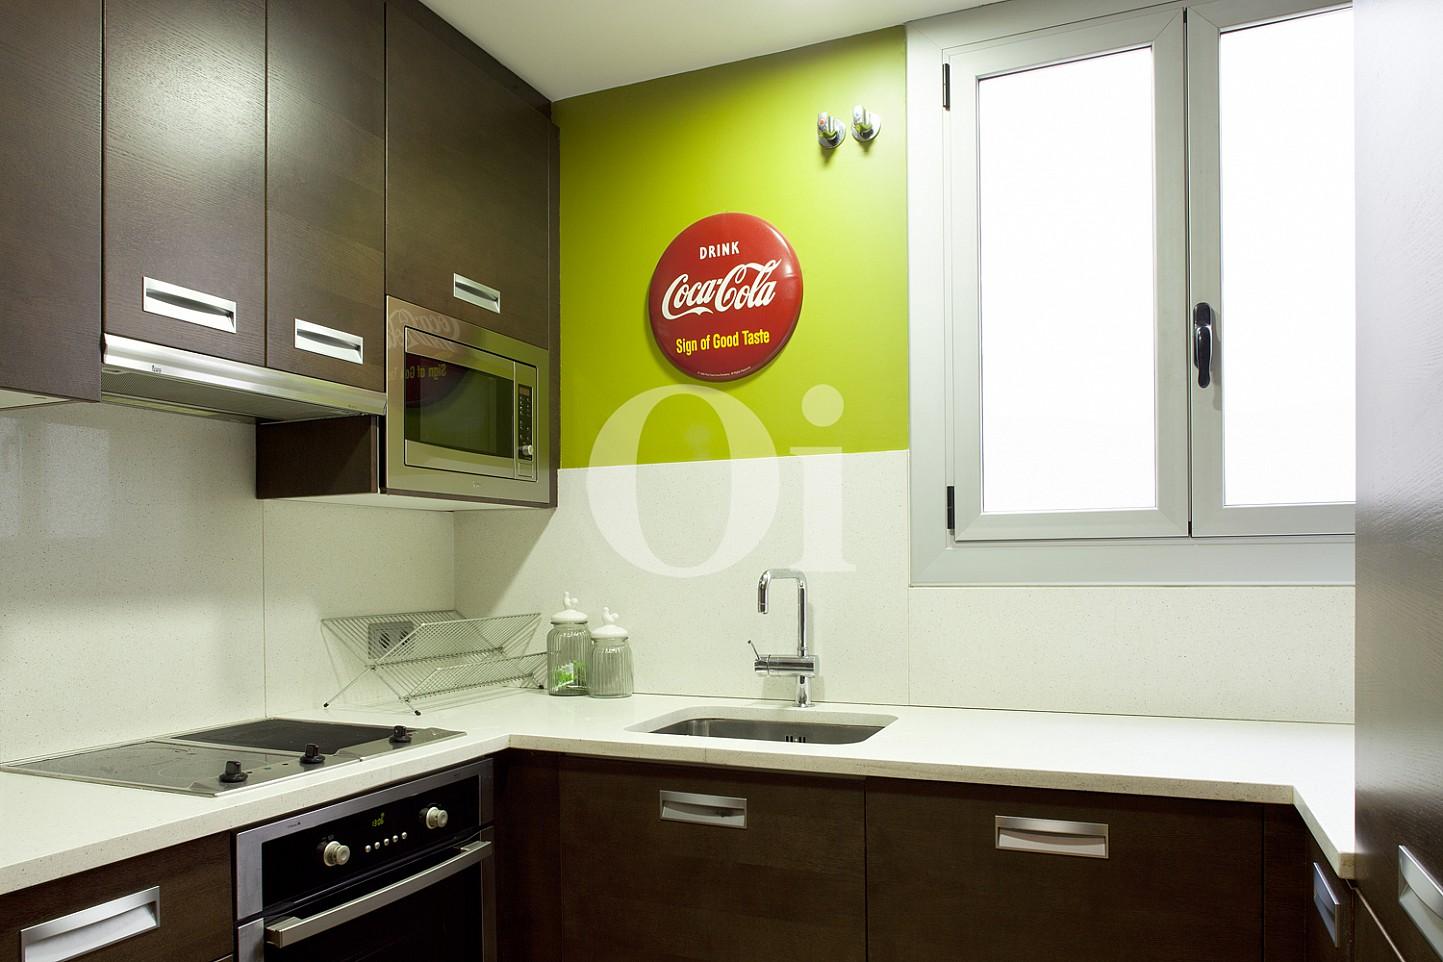 cocina, cocina equipada, electrodomésticos, cocina con electrodomésticos, horno, vitrocerámica, campana extractora